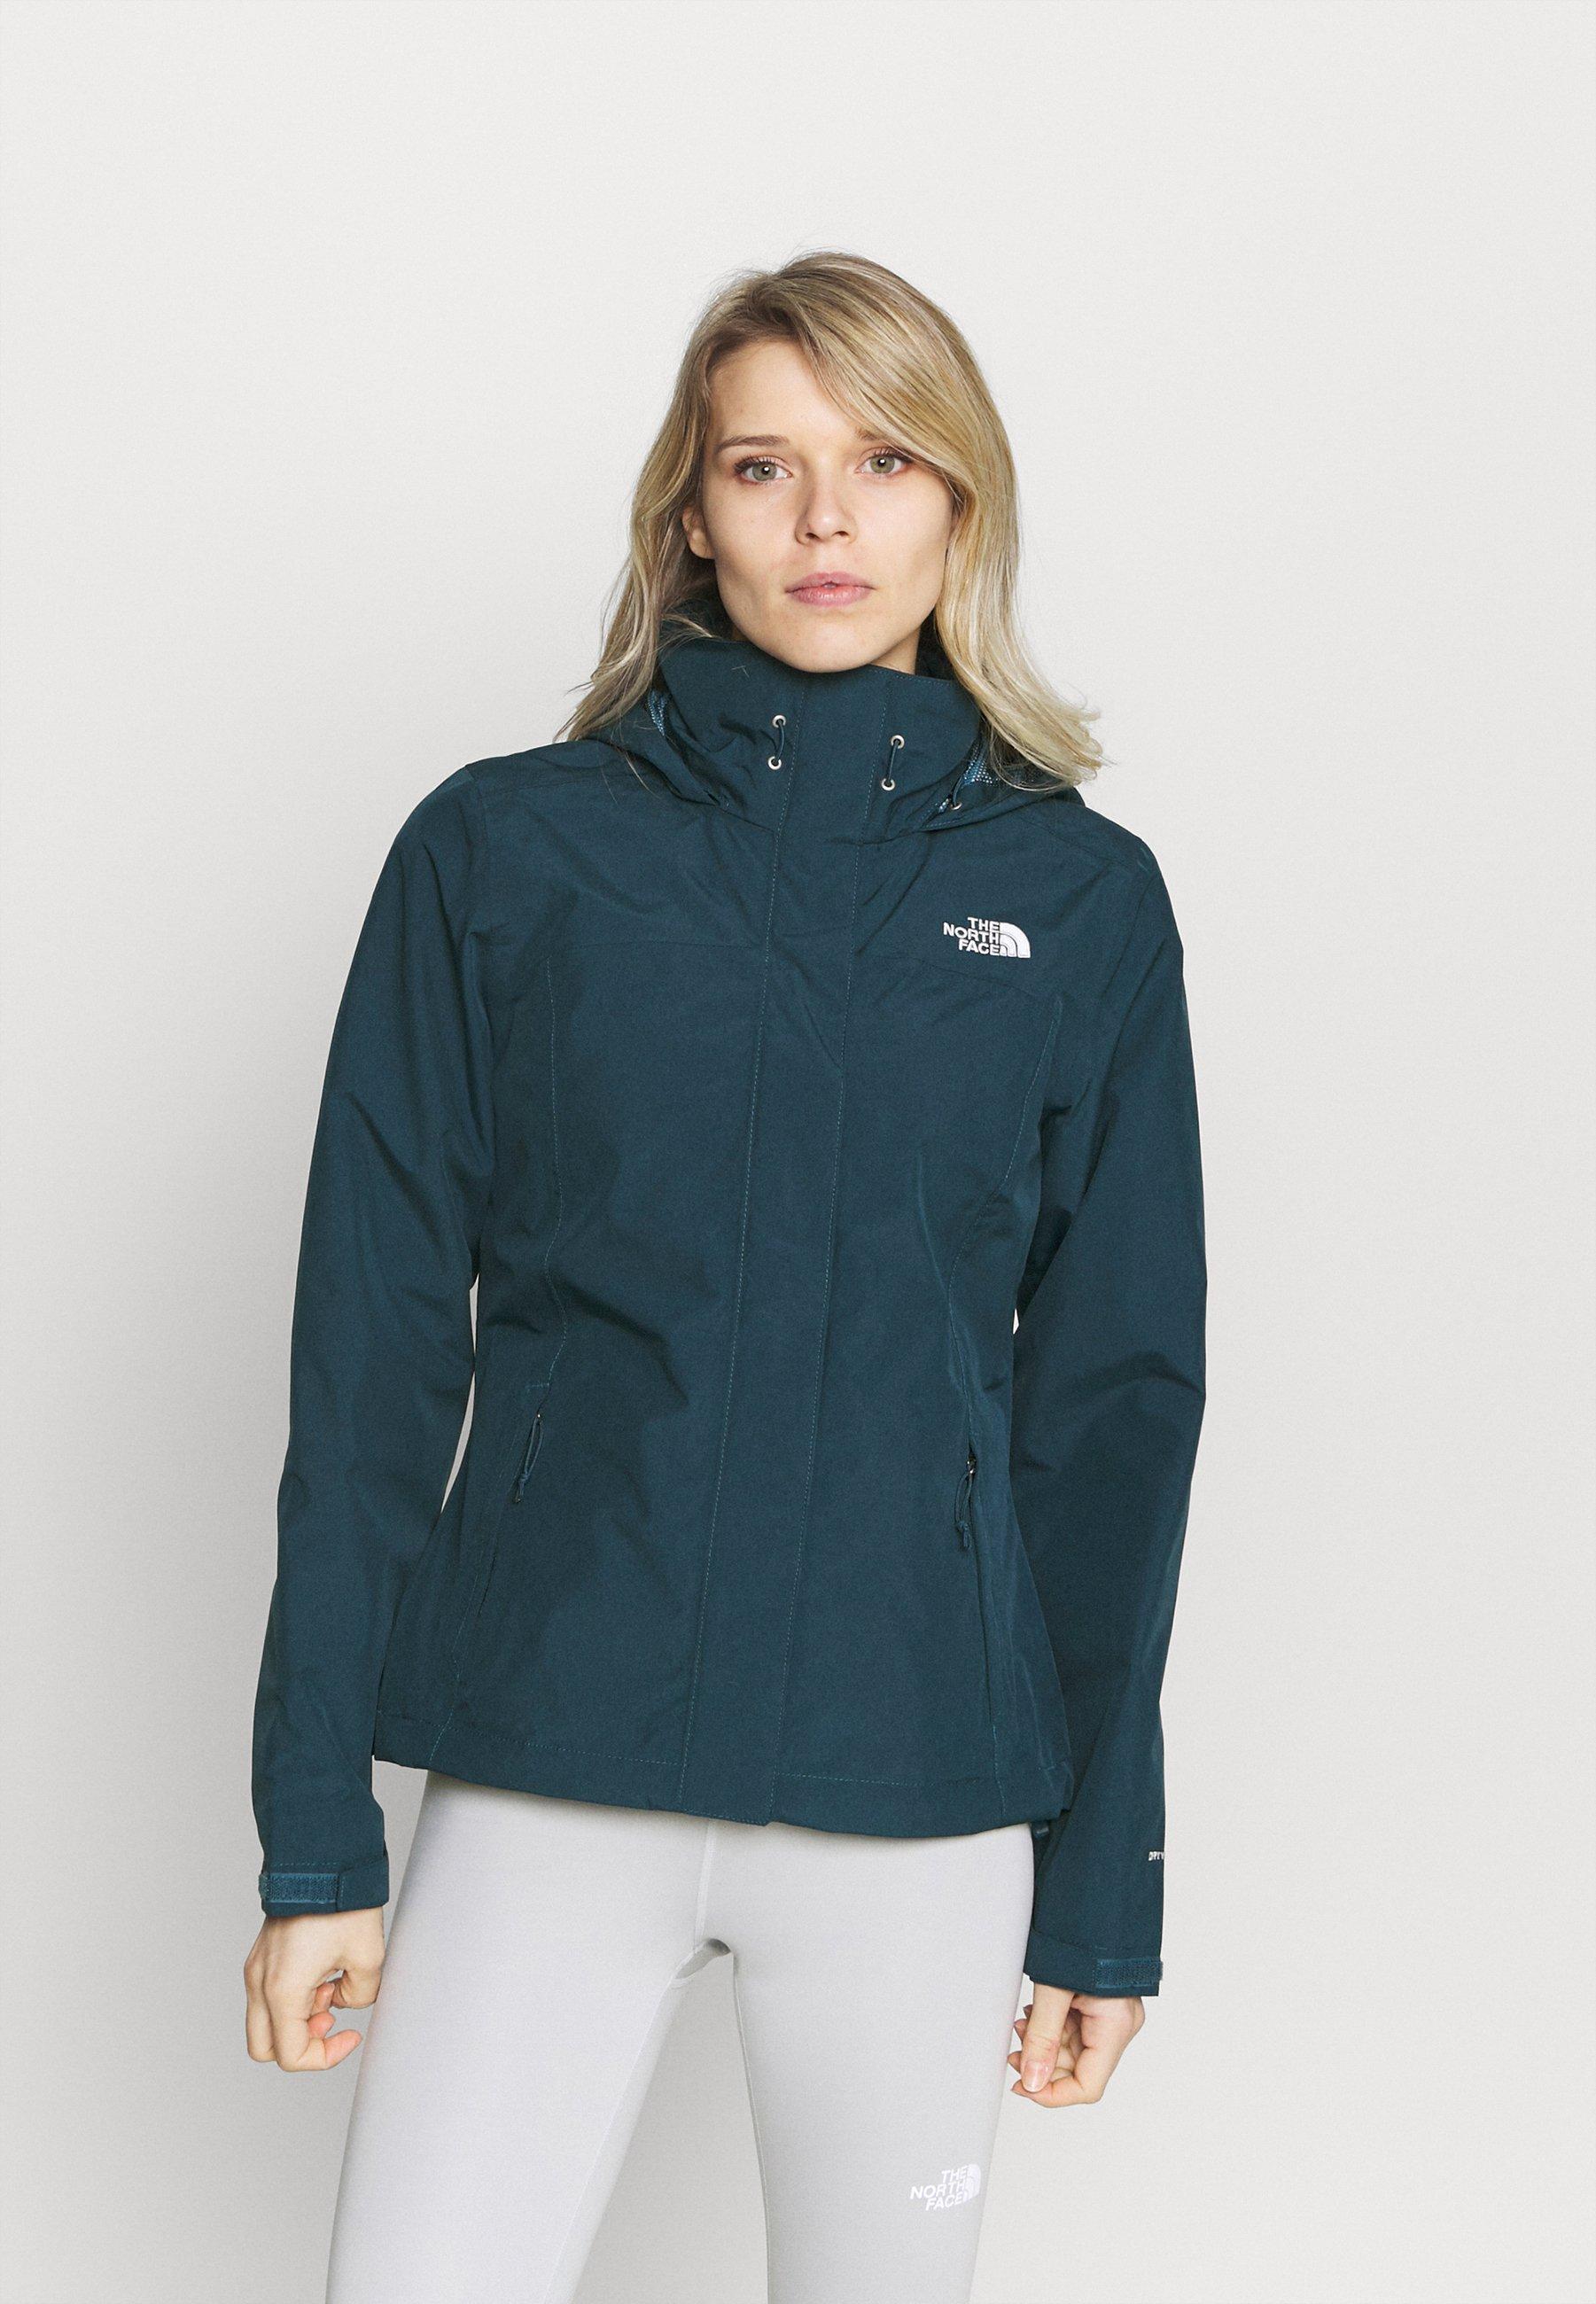 Women SANGRO JACKET - Hardshell jacket - montery blu dark heather